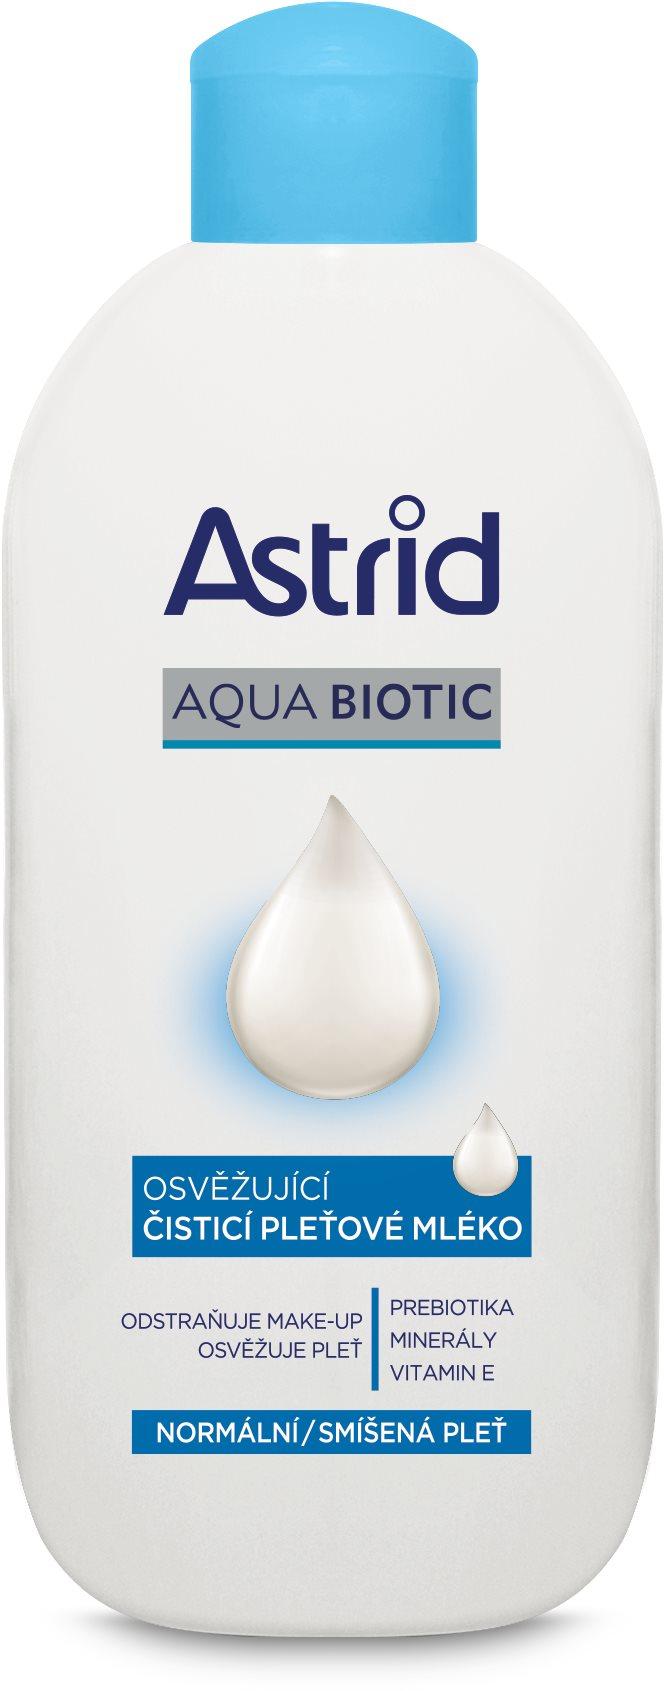 ASTRID Fresh Skin arctej 200 ml